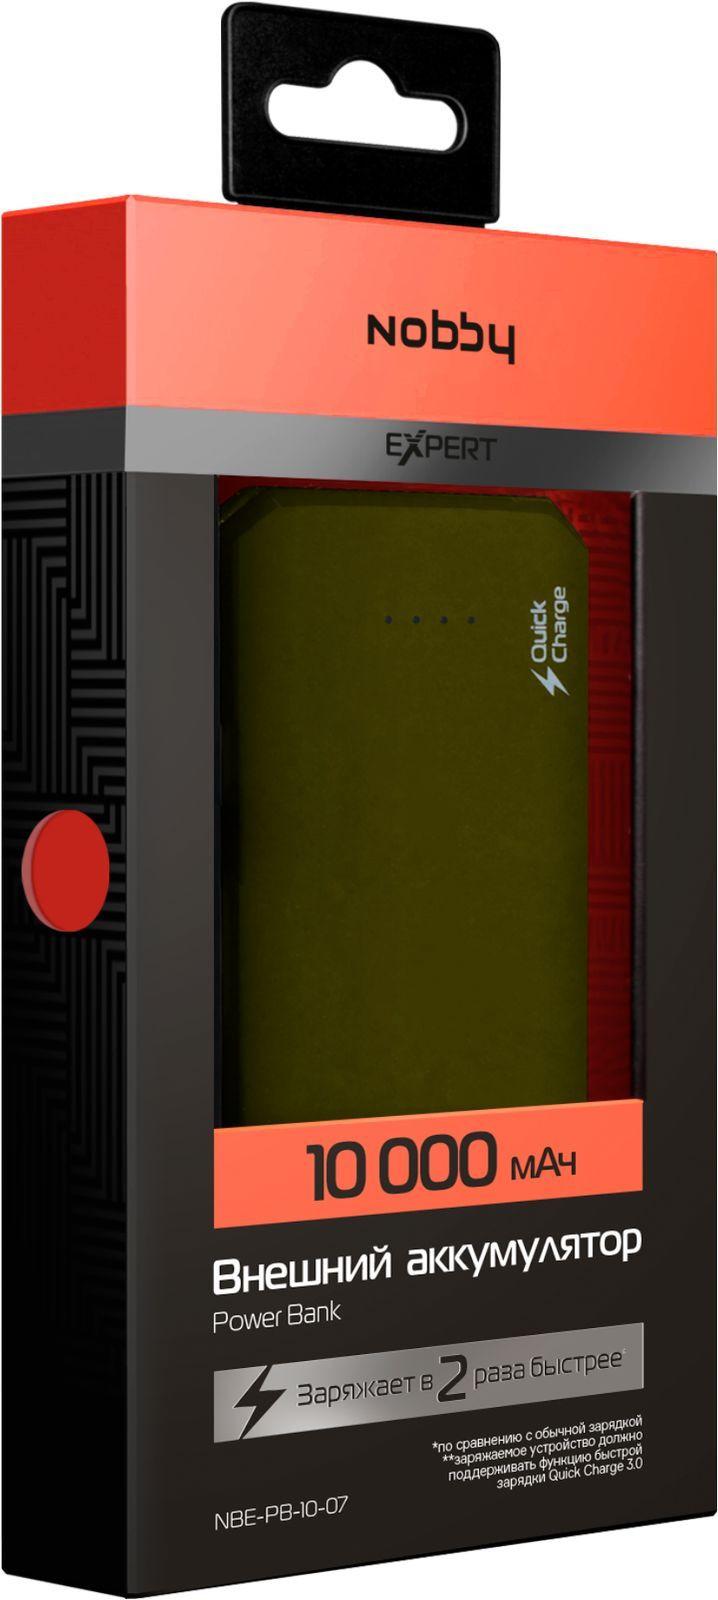 Фото - Внешний аккумулятор Nobby NBE-PB-10-07 10000 мАч, темно-зеленый аккумулятор